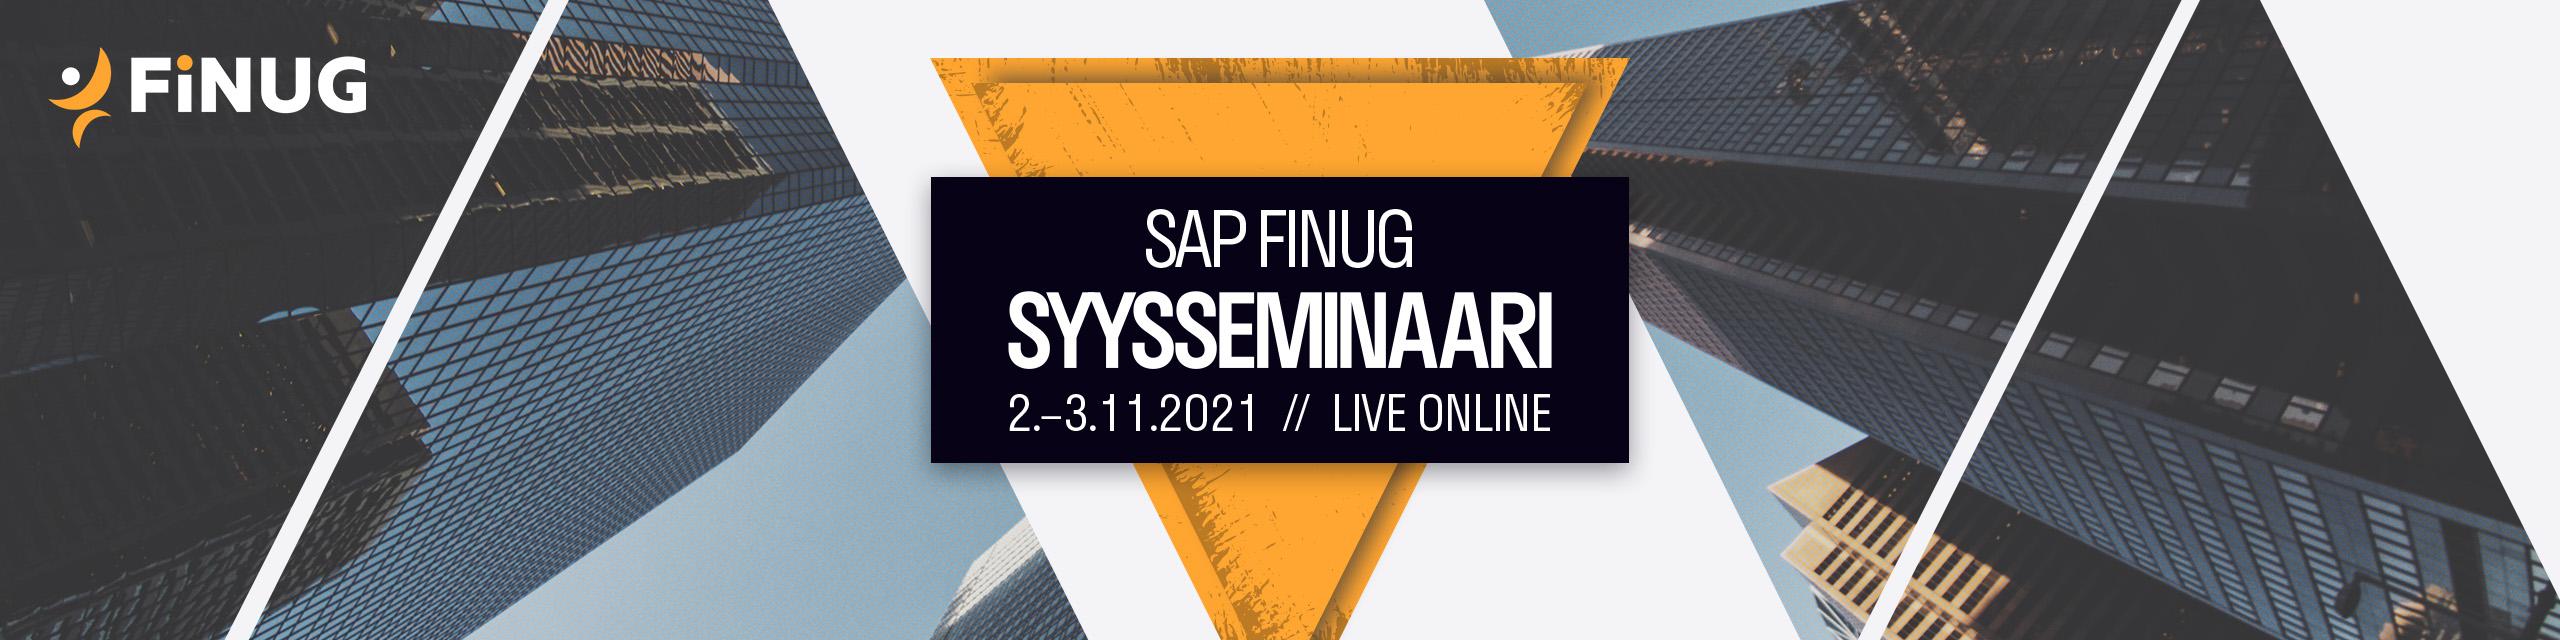 SAP Finug Syysseminaari 2021 Live Online